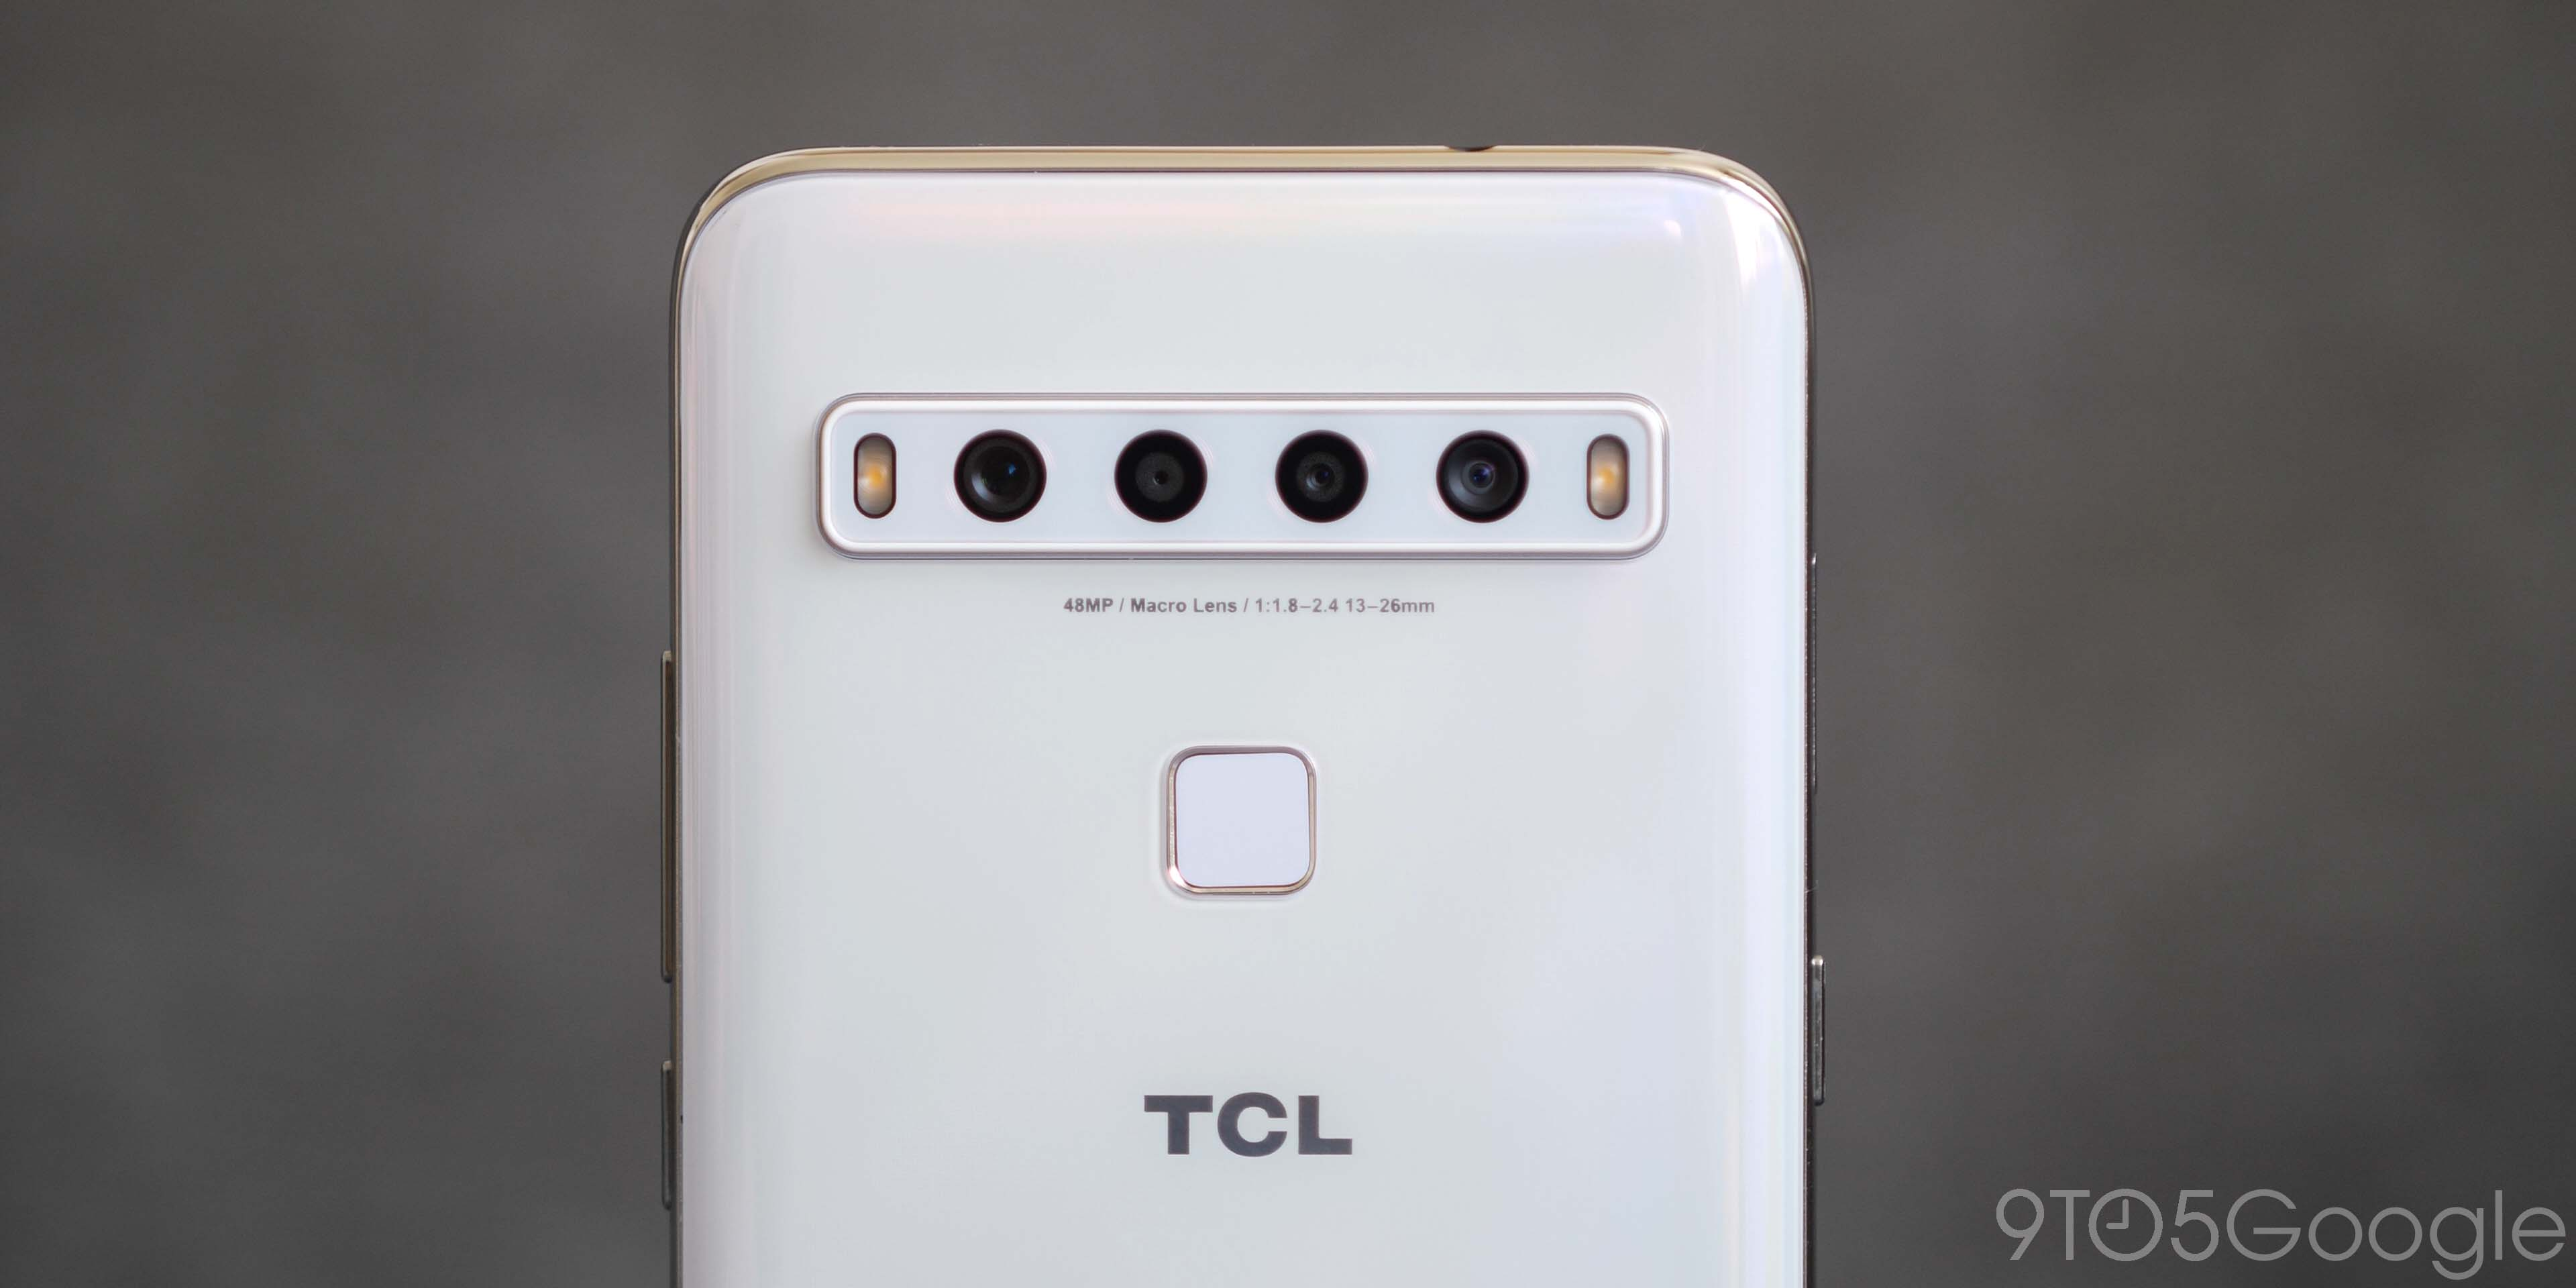 TCL 10L camera